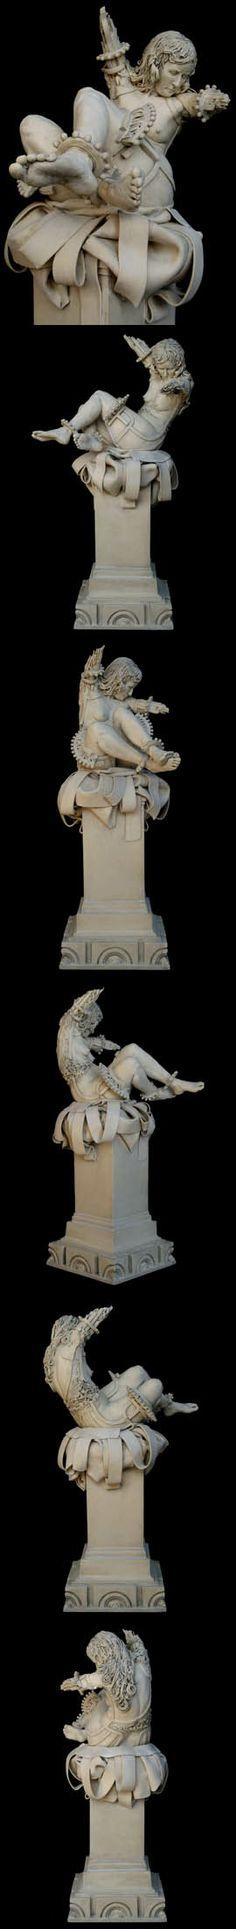 "Just breathtaking. Clea Carlsen ""NIKE FALLEN"" Ceramic sculpture."